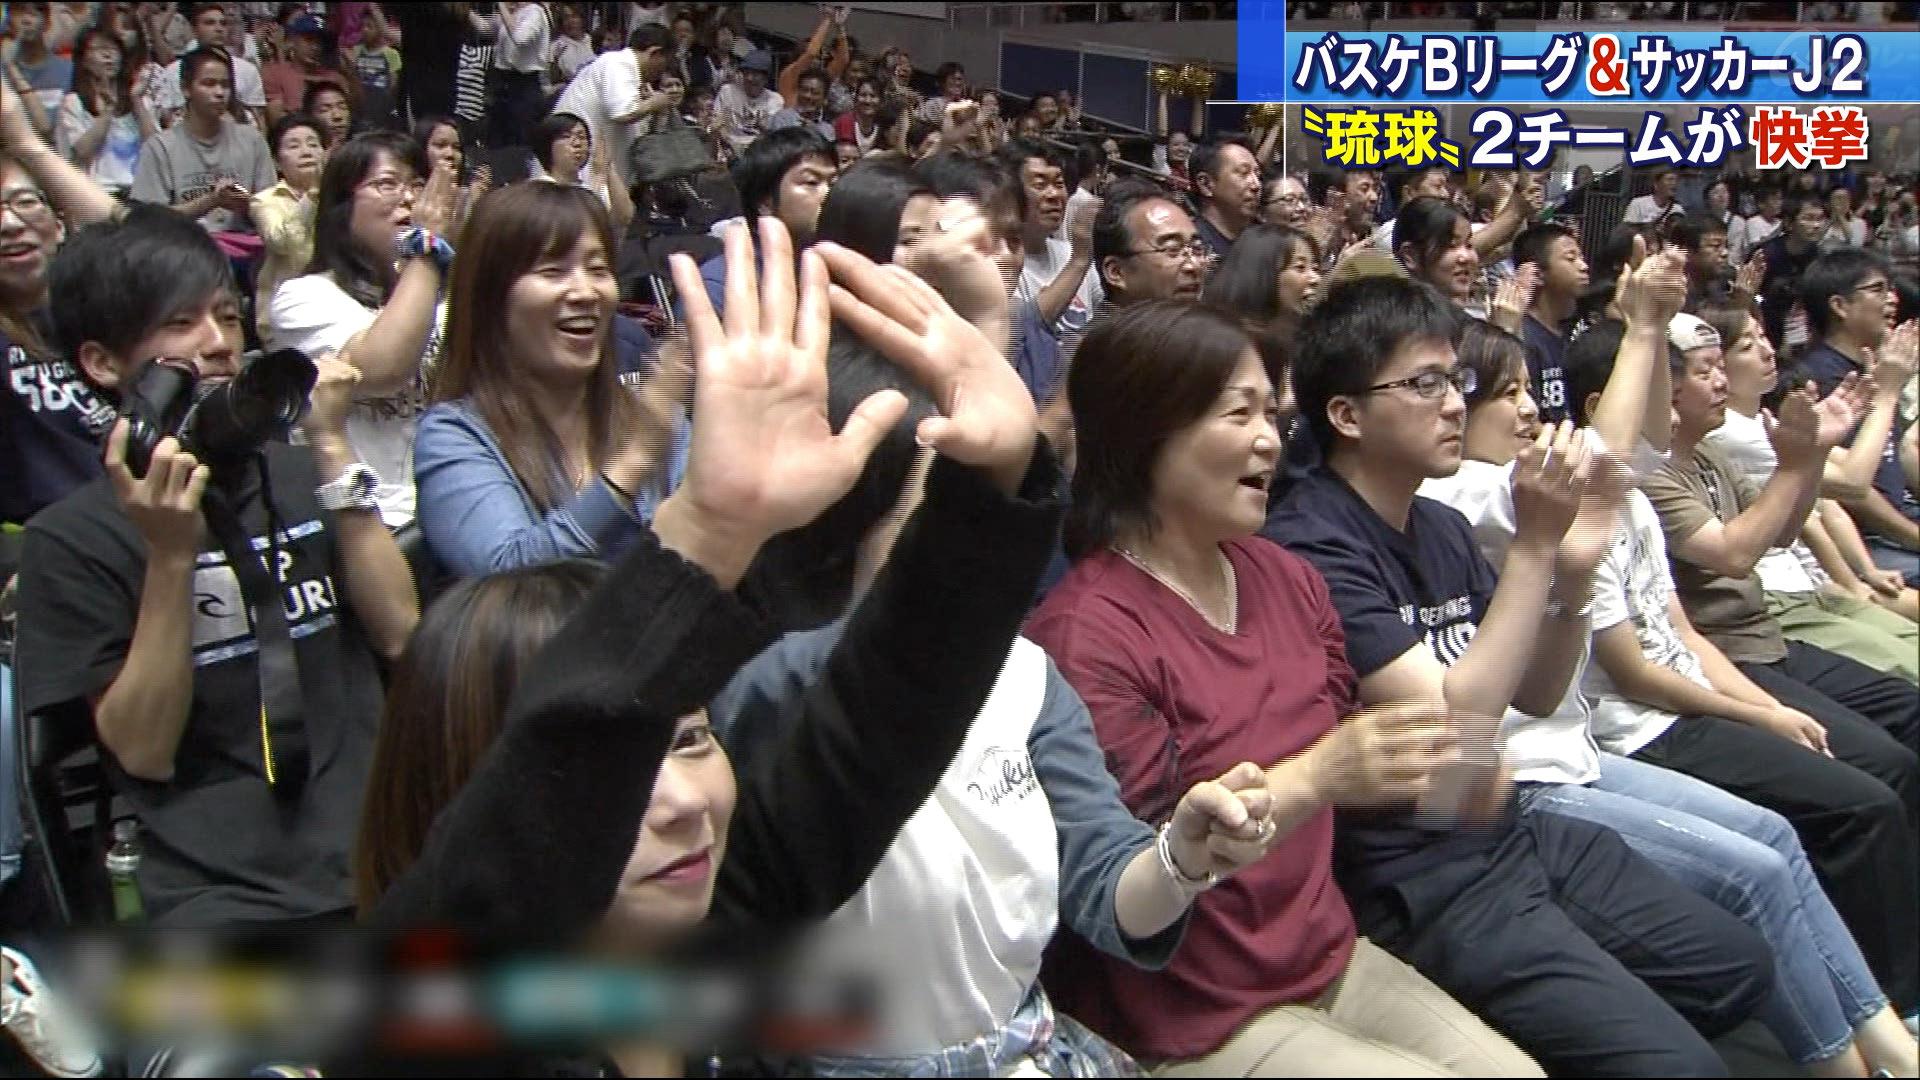 キングス西地区優勝&FC琉球J記録